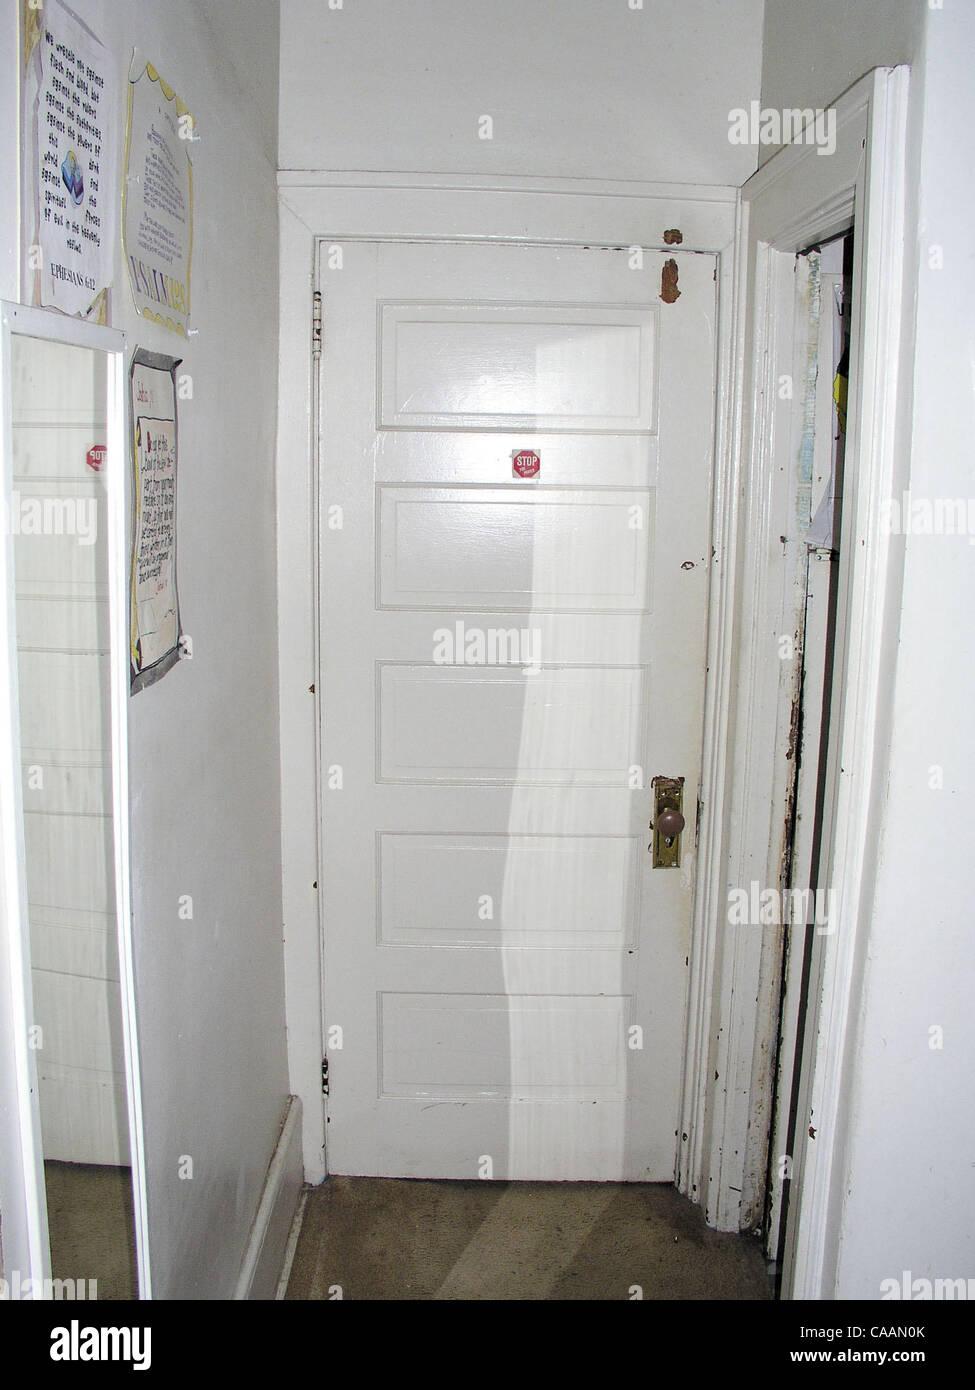 Police In Kitchen Stockfotos & Police In Kitchen Bilder - Alamy